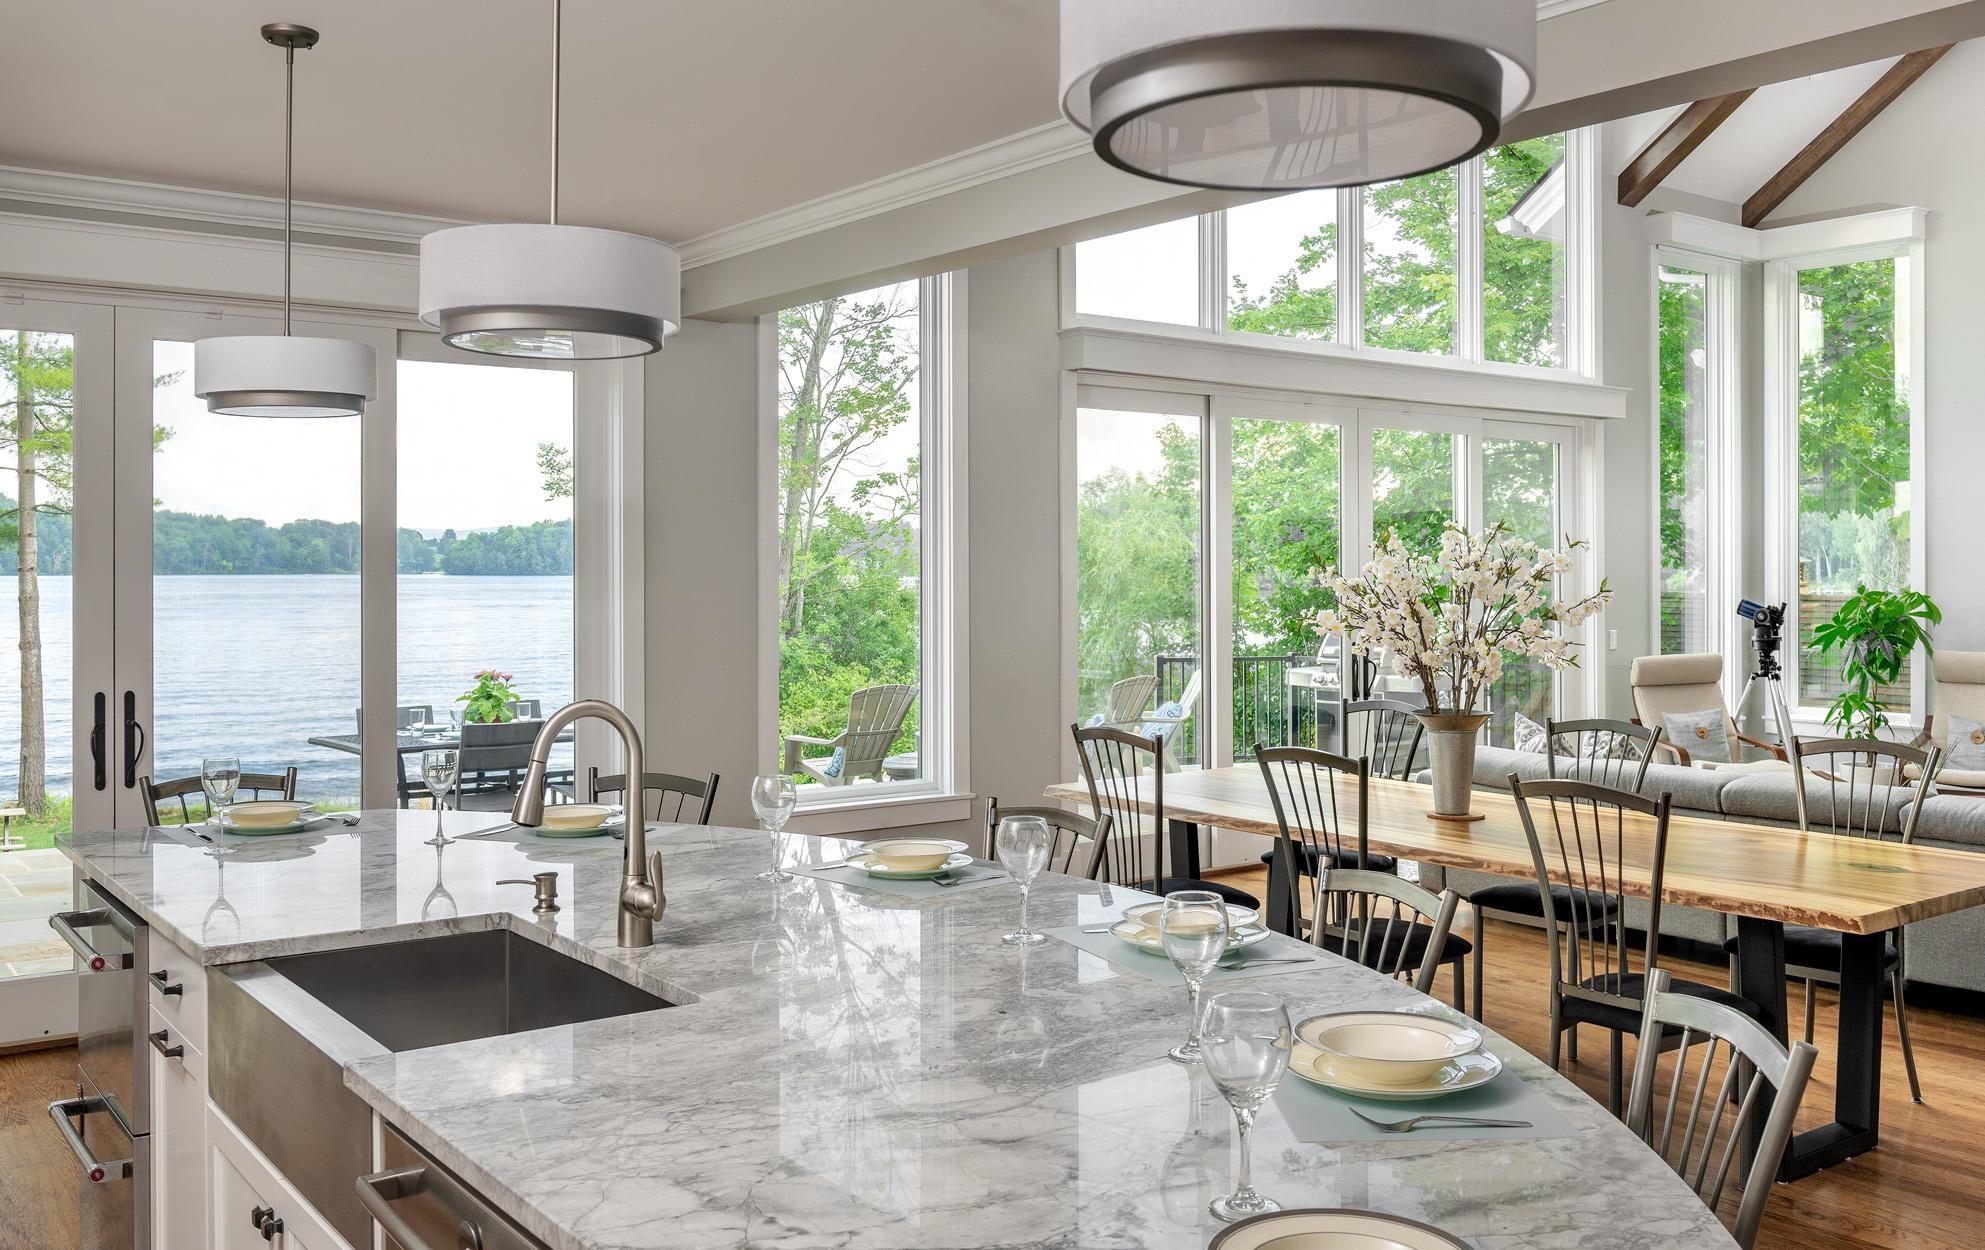 Kitchen Overlooking Dining/Living Room